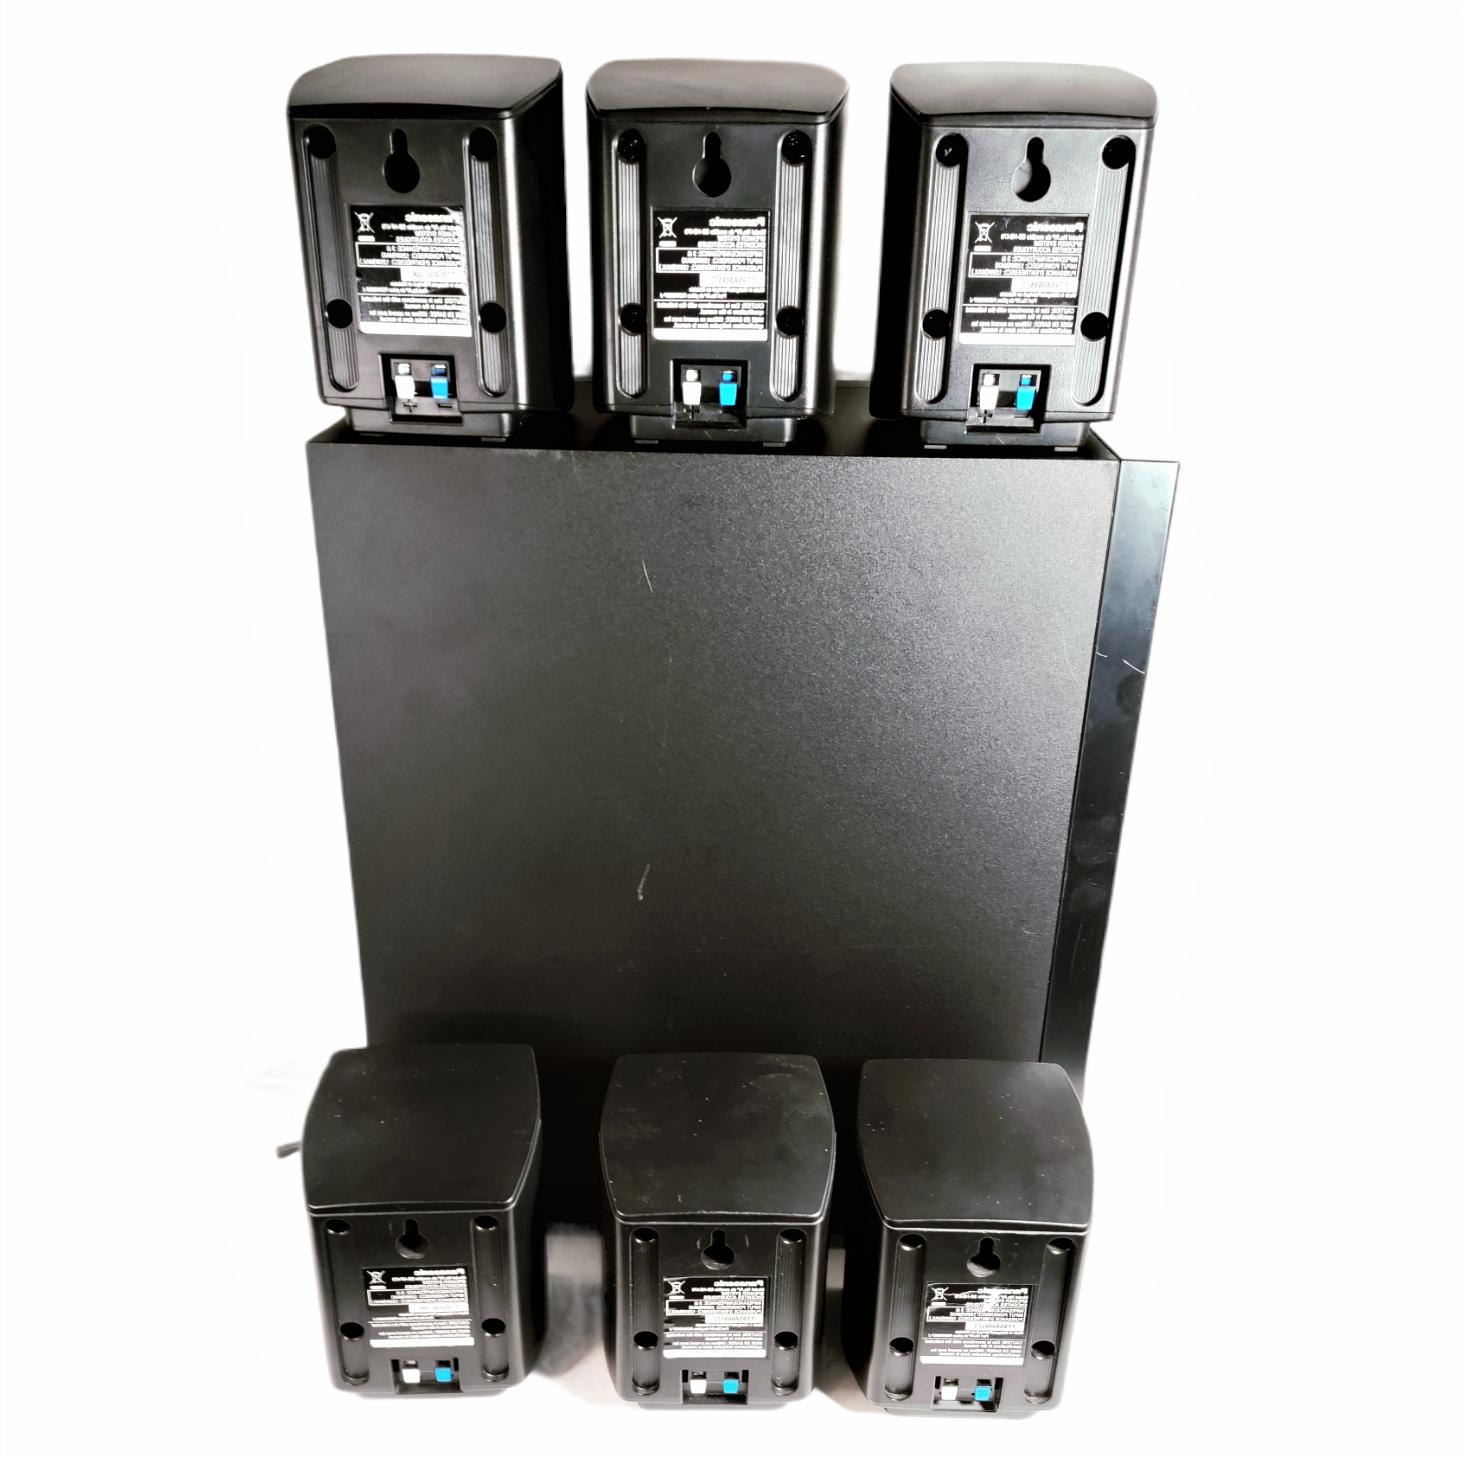 Panasonic w/6 Small Surround Sound